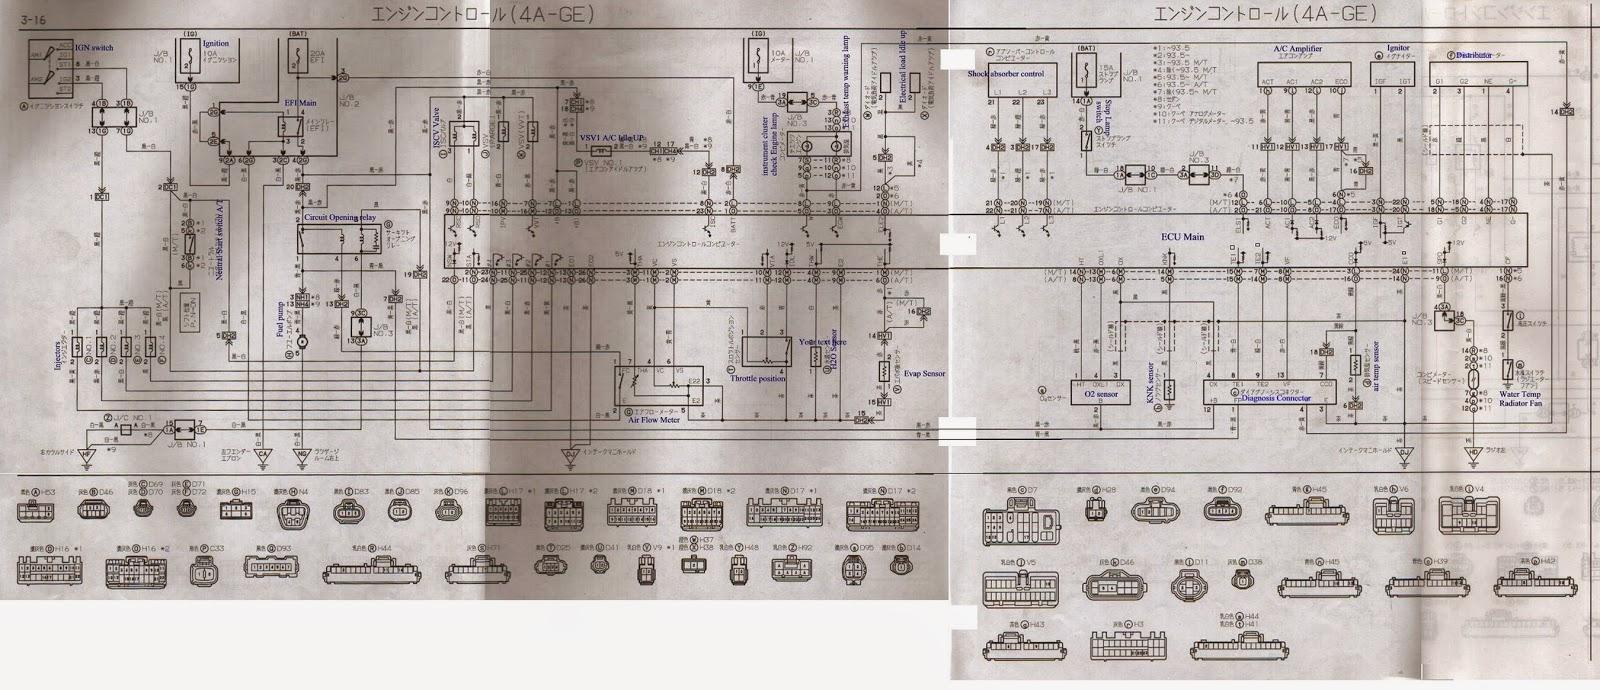 Toyota Kzn185 Wiring Diagram